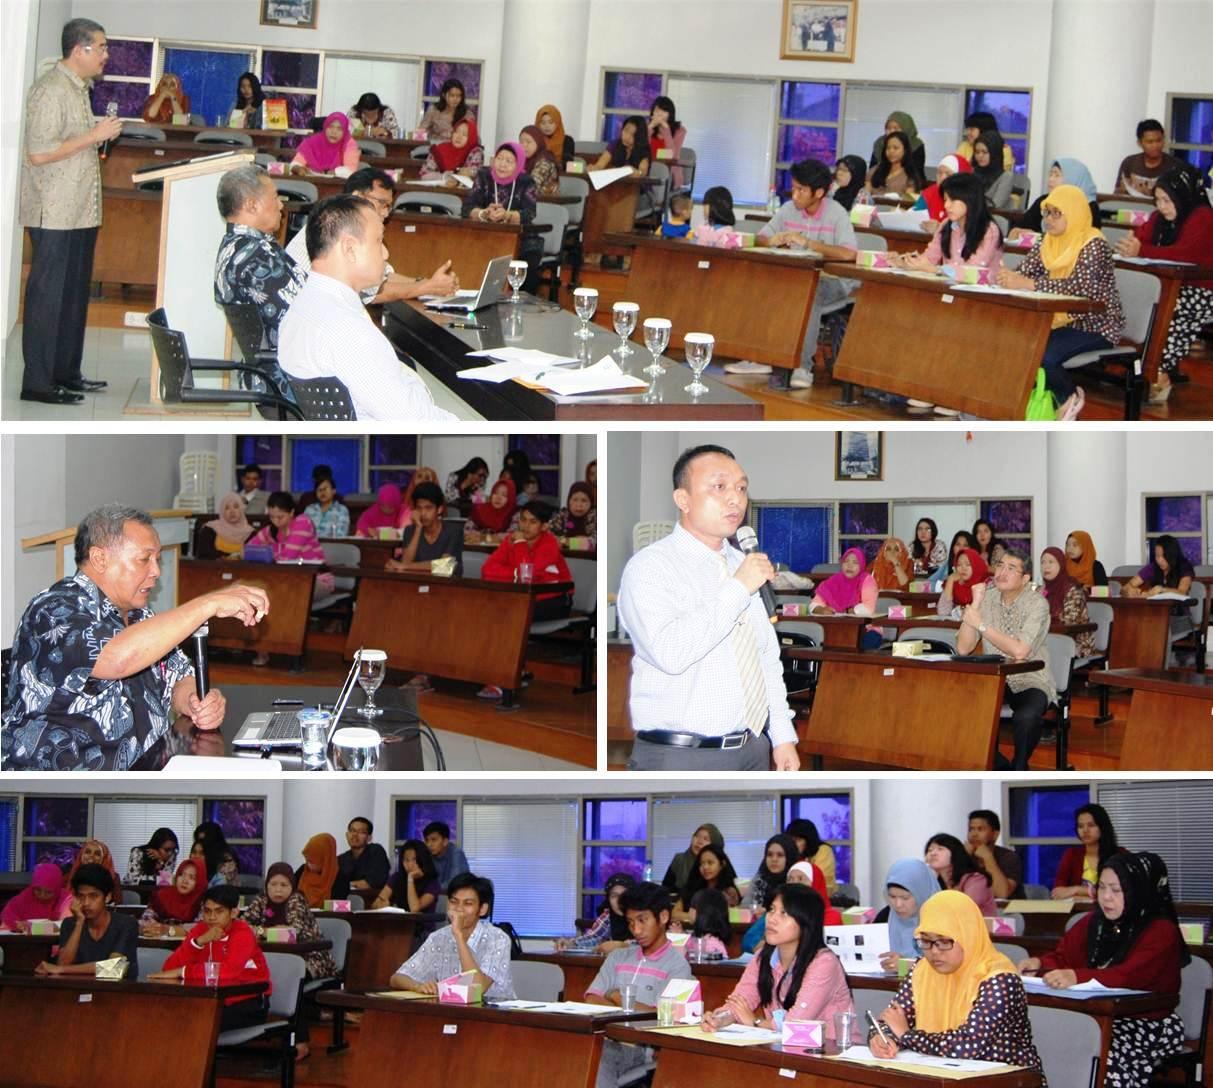 Pelatihan Pencegahan Penyalahgunaan Narkoba di Universitas Esa Unggul